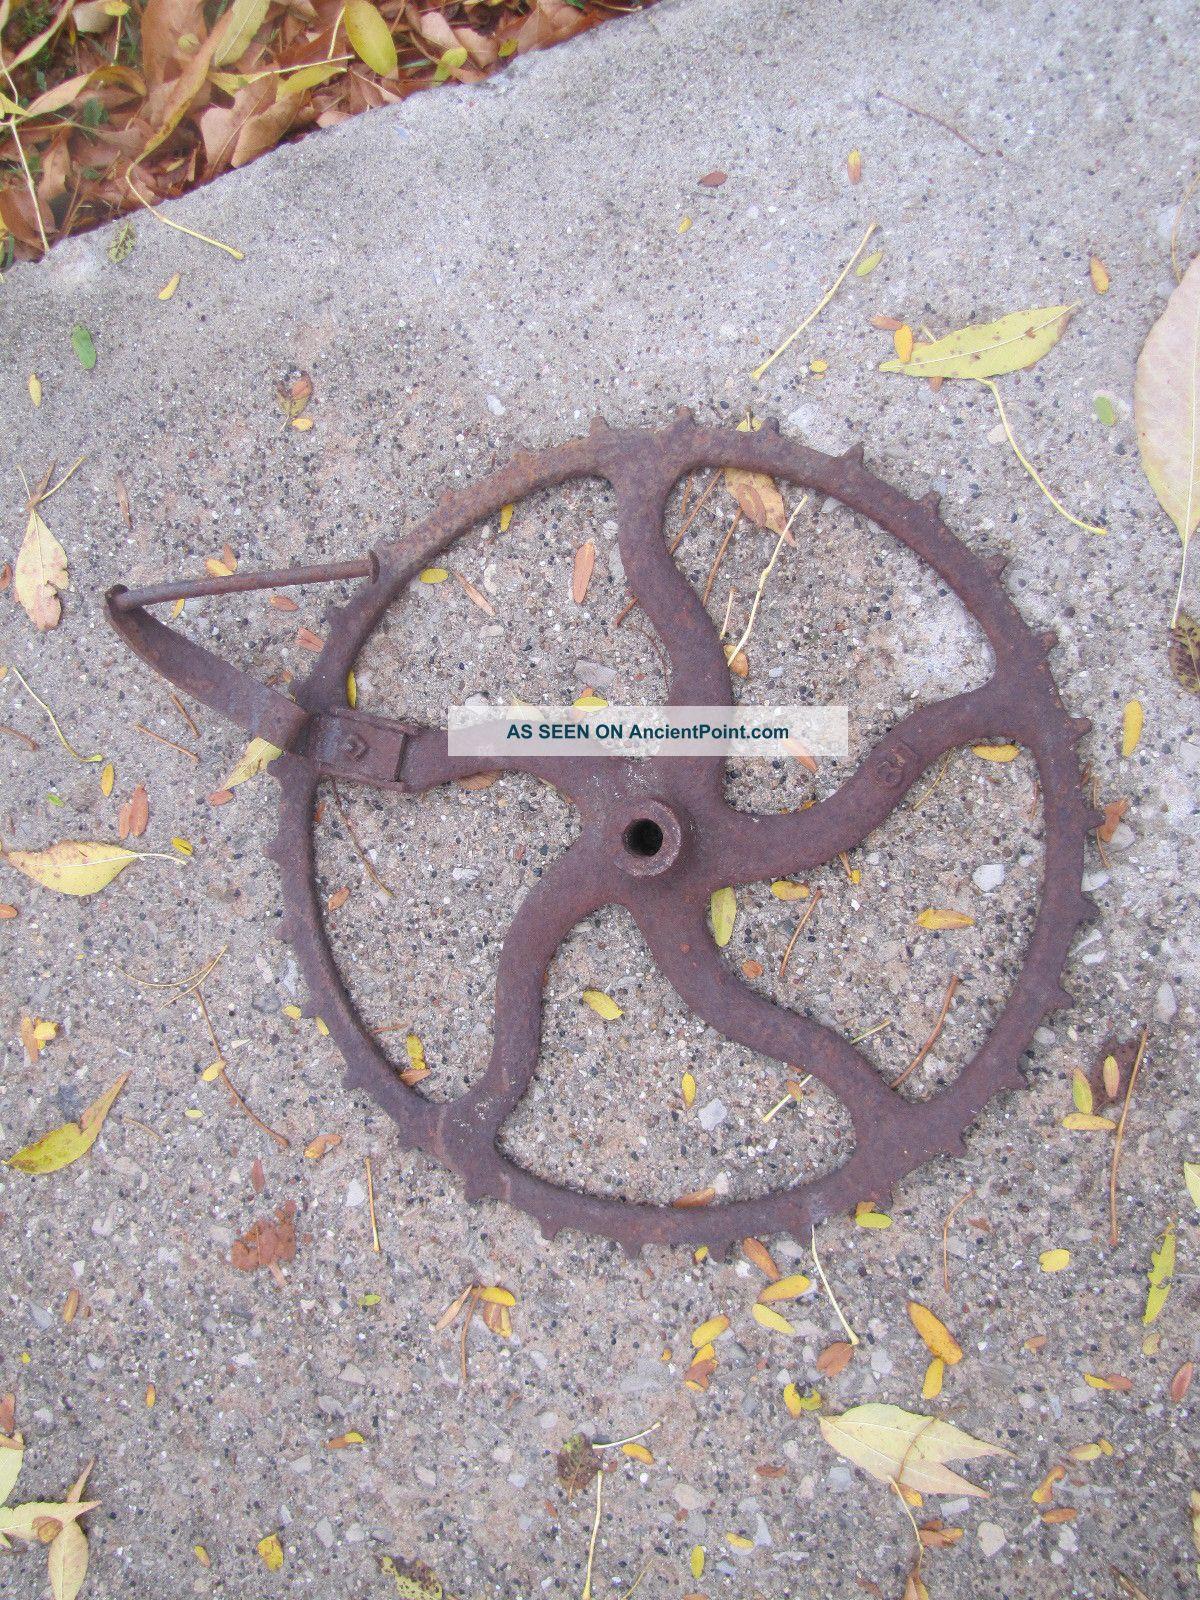 Primitive/antique Cast Iron Gear Steampunk Groovy Yard Art Decorative Metalware photo